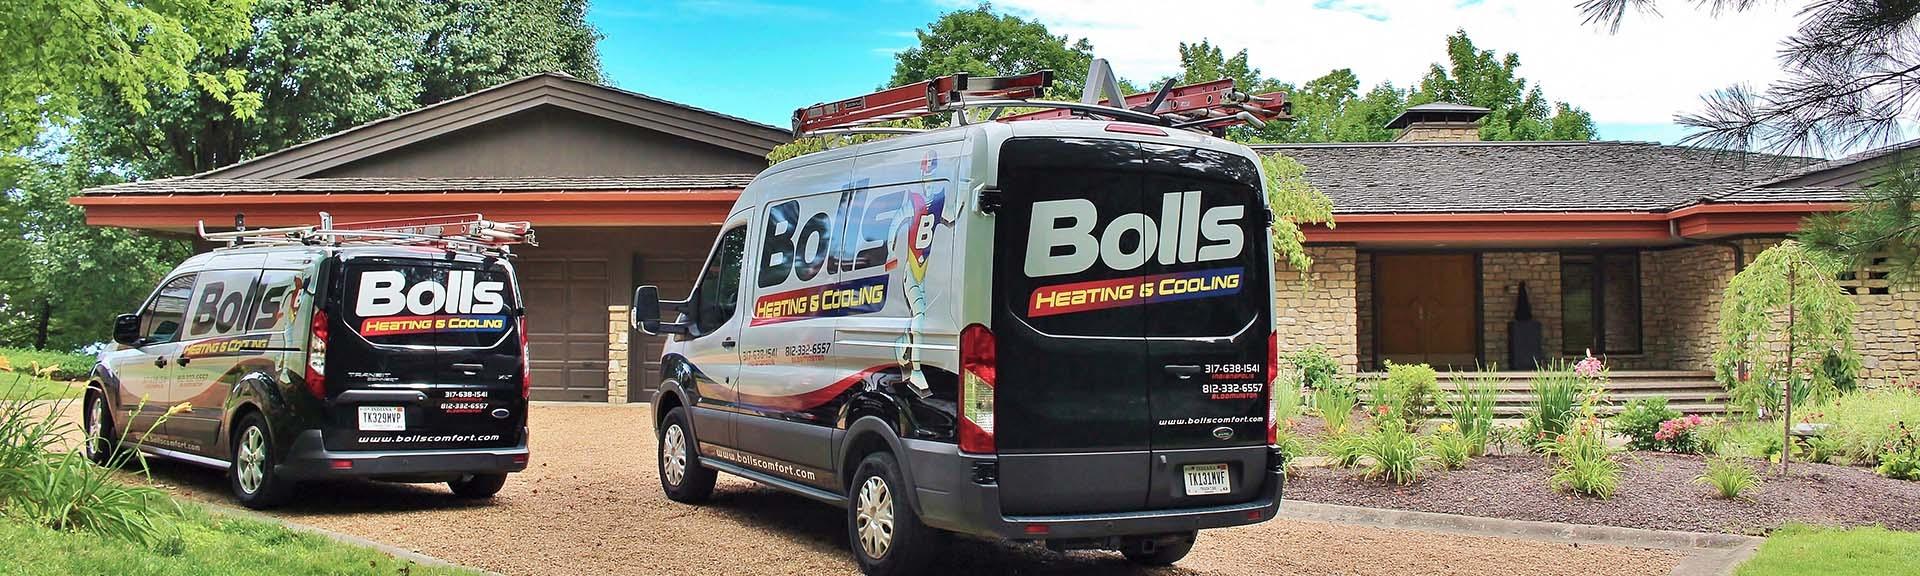 Bolls Heating & Cooling (@bollsheatingandcooling) Cover Image